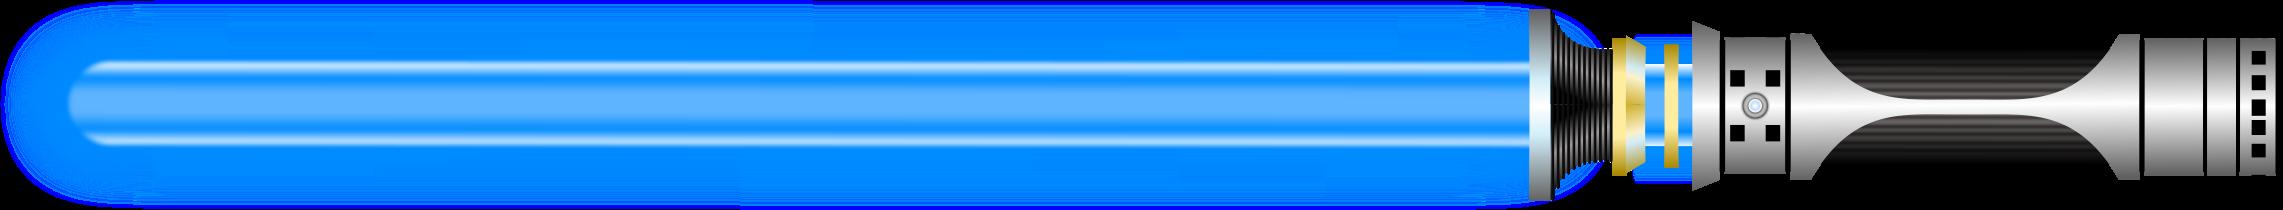 Laser clipart Laser Spada laser blu Clipart